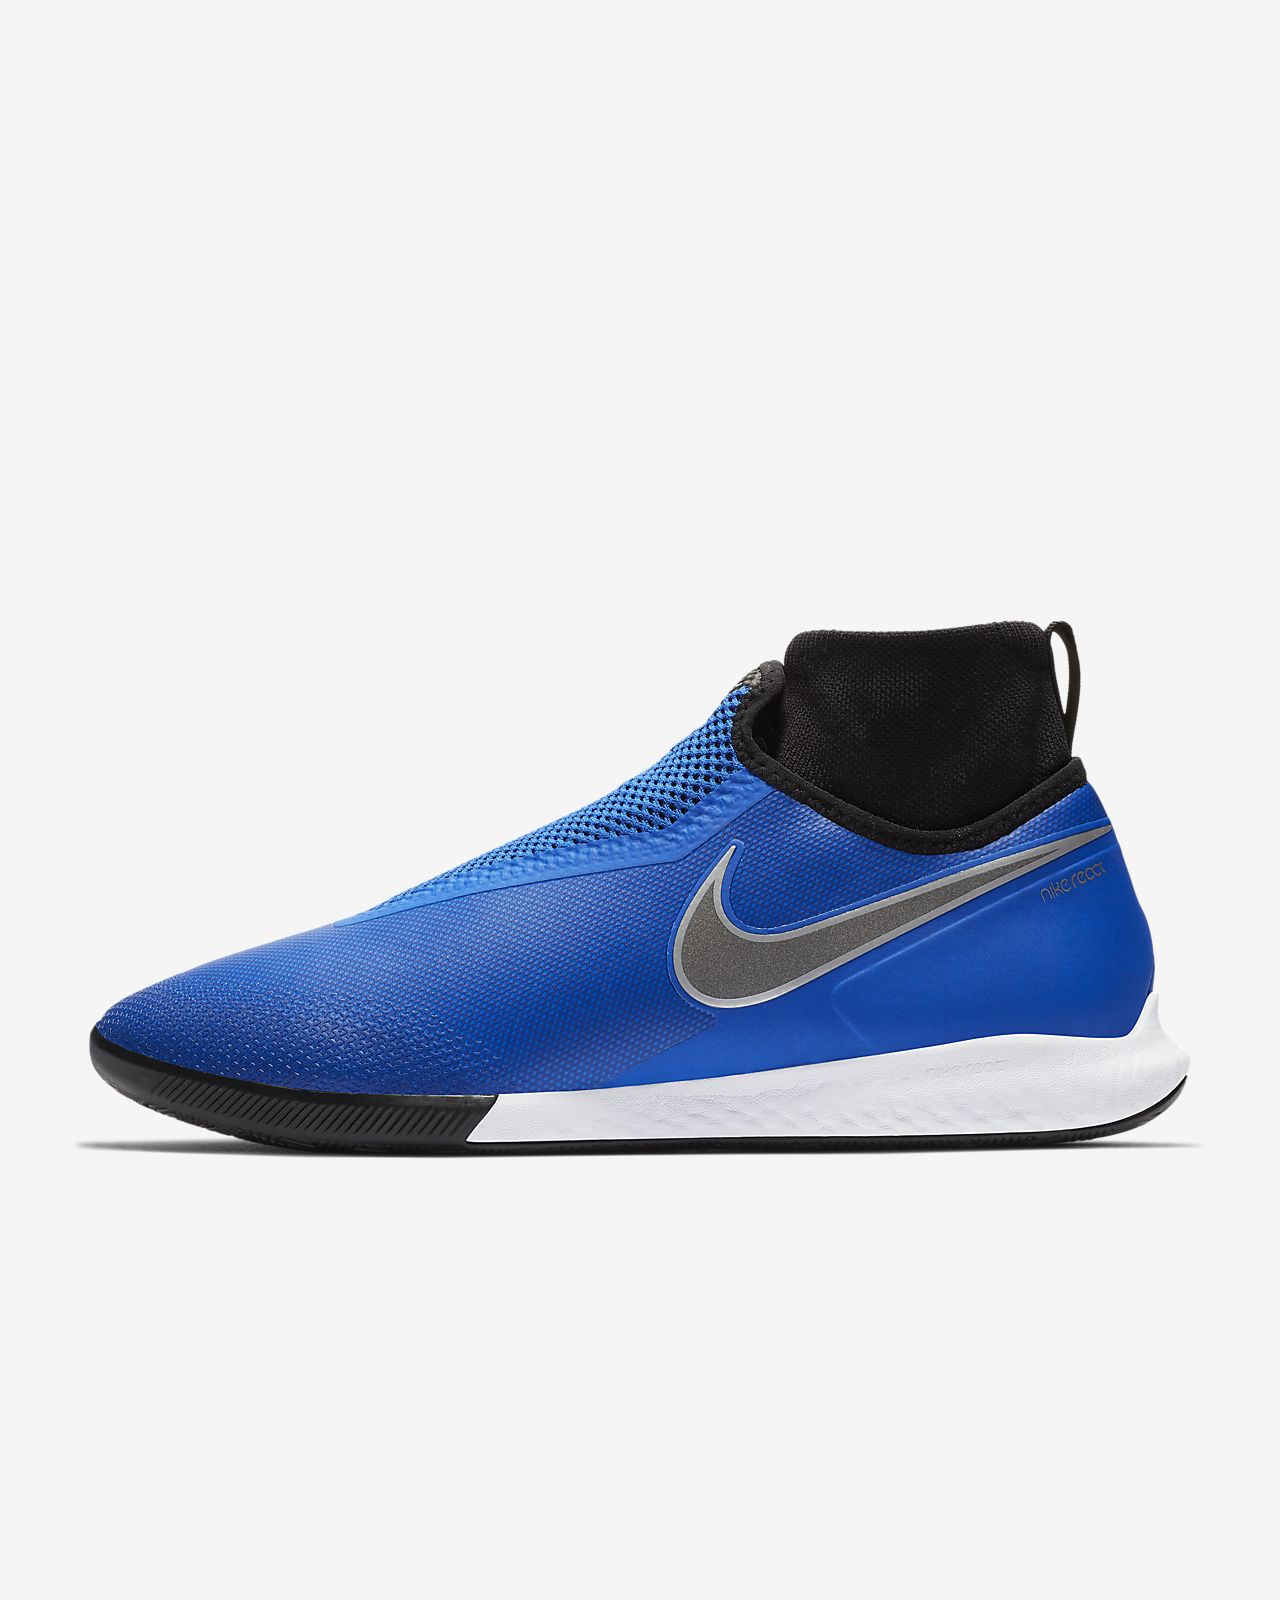 eddb135a2 Nike React Phantom Vision Pro Dynamic Fit Indoor/Court Football Shoe ...